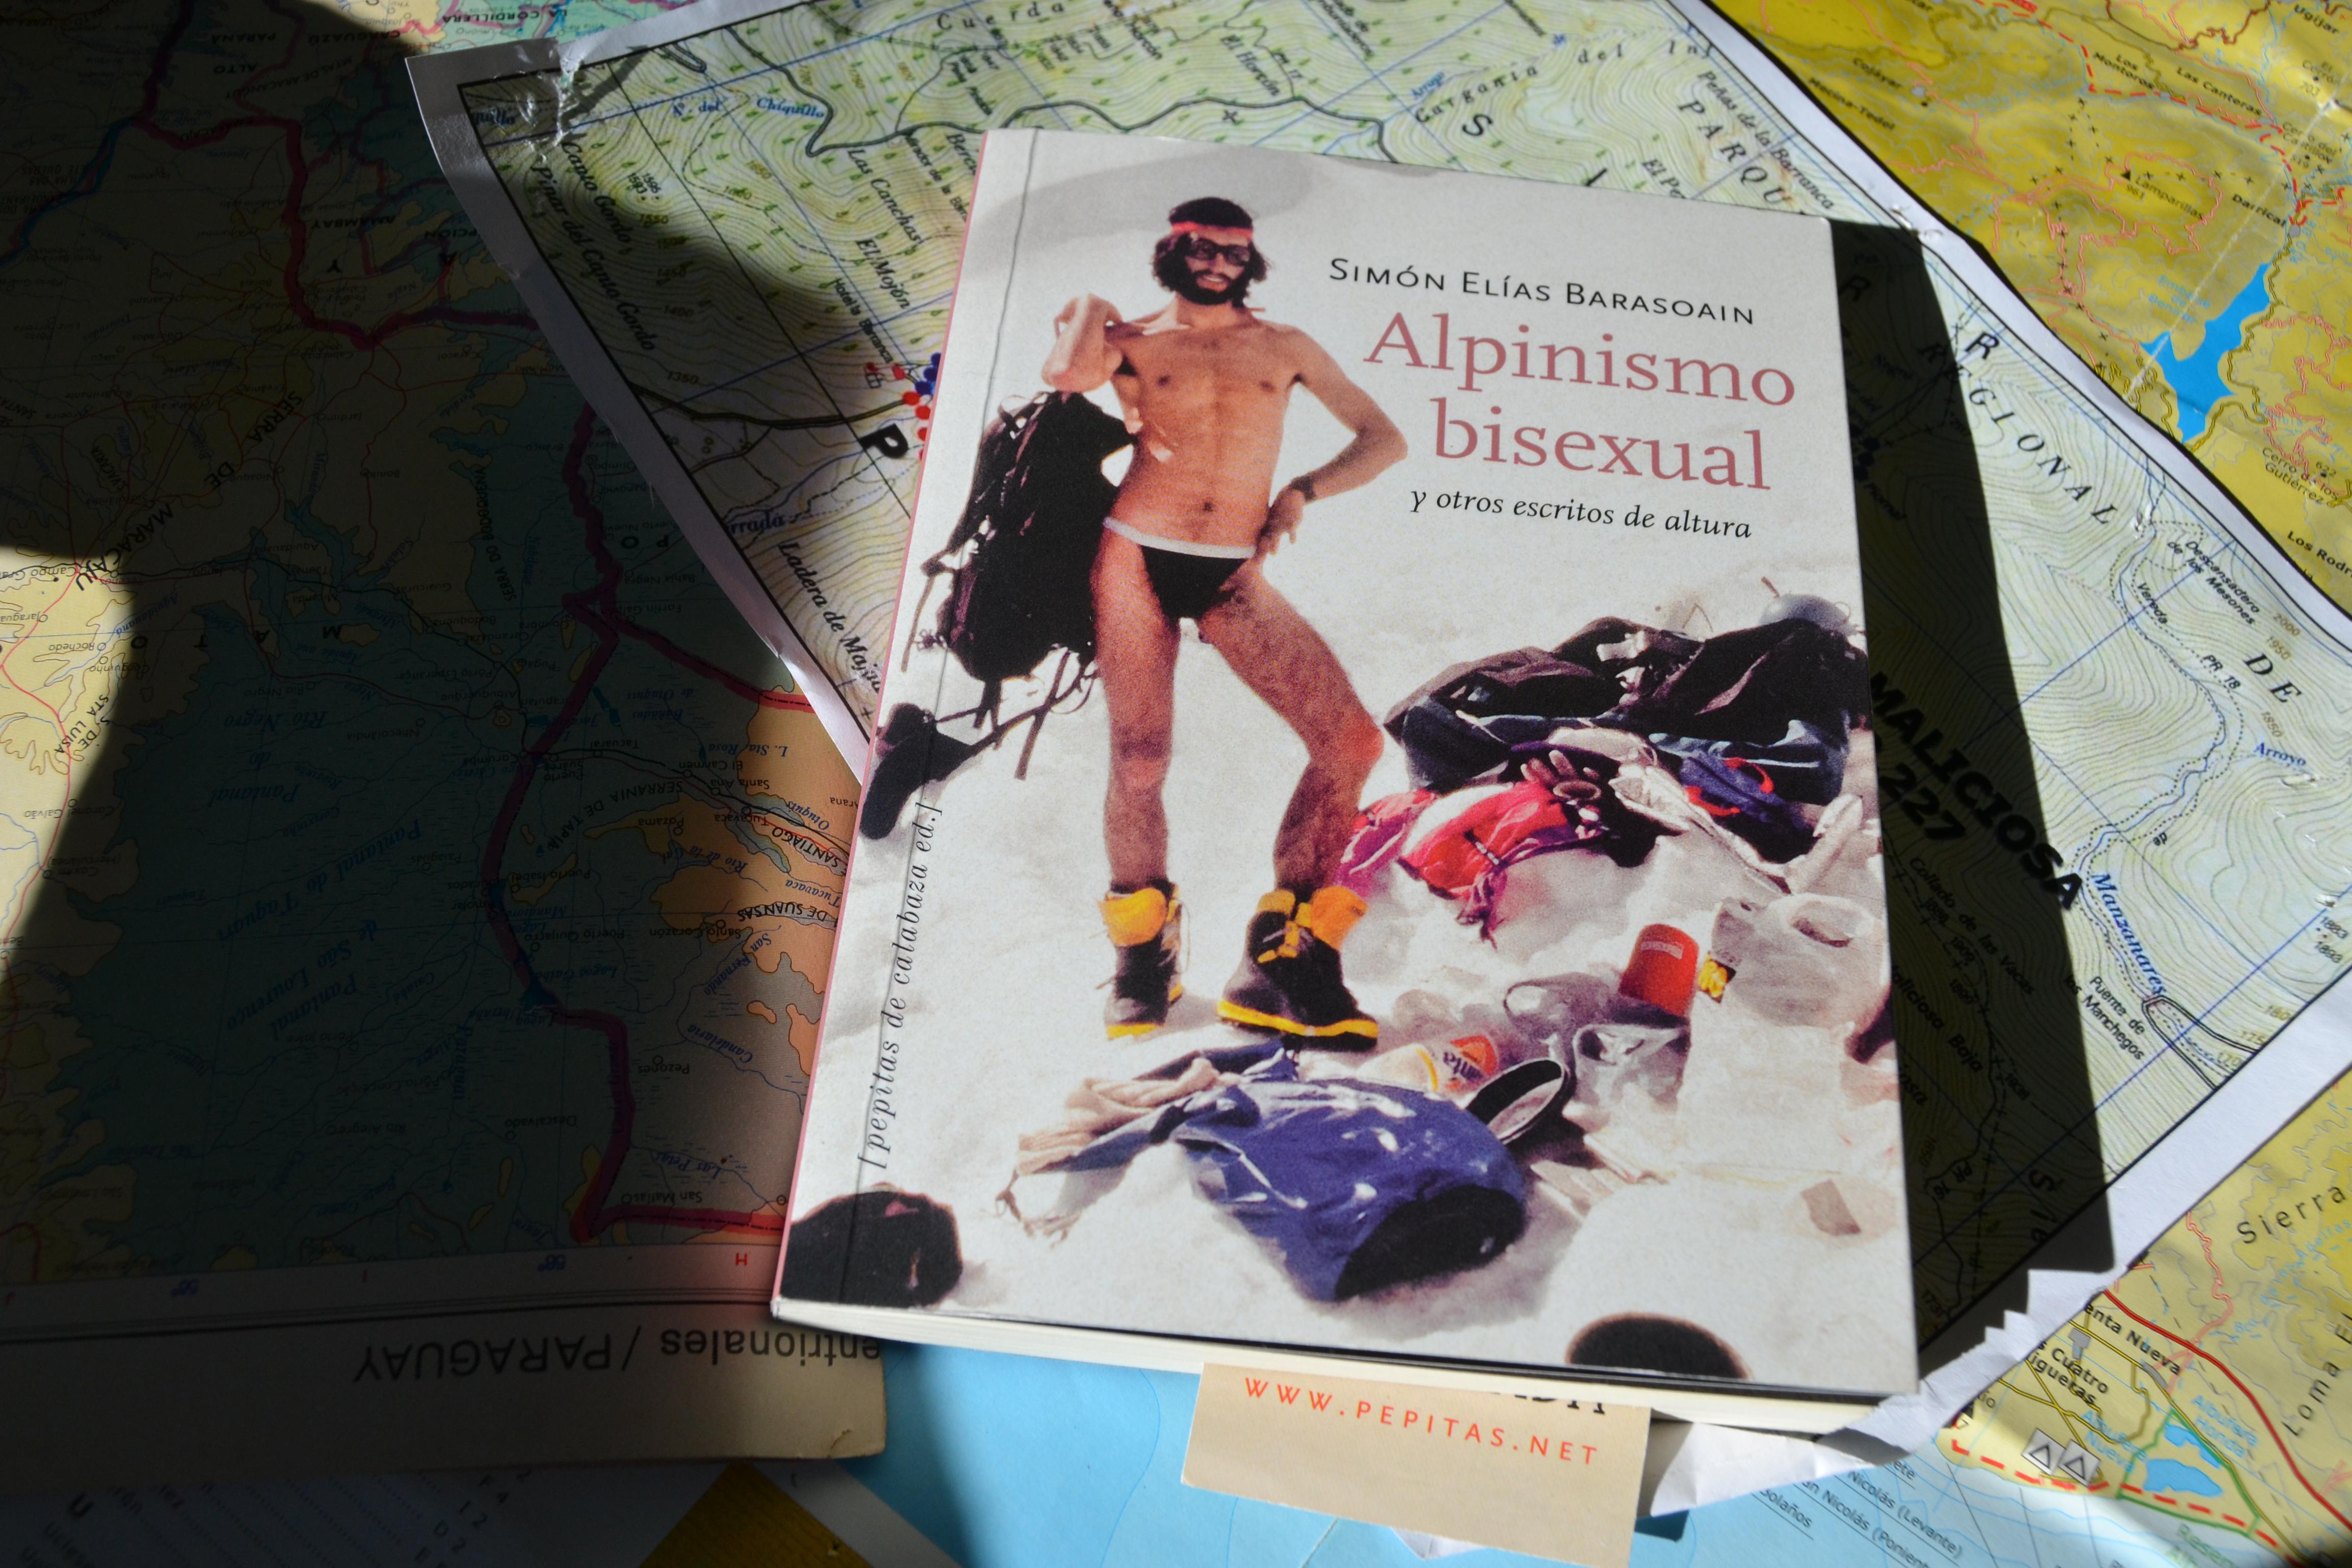 Alpinismo bisexual simon